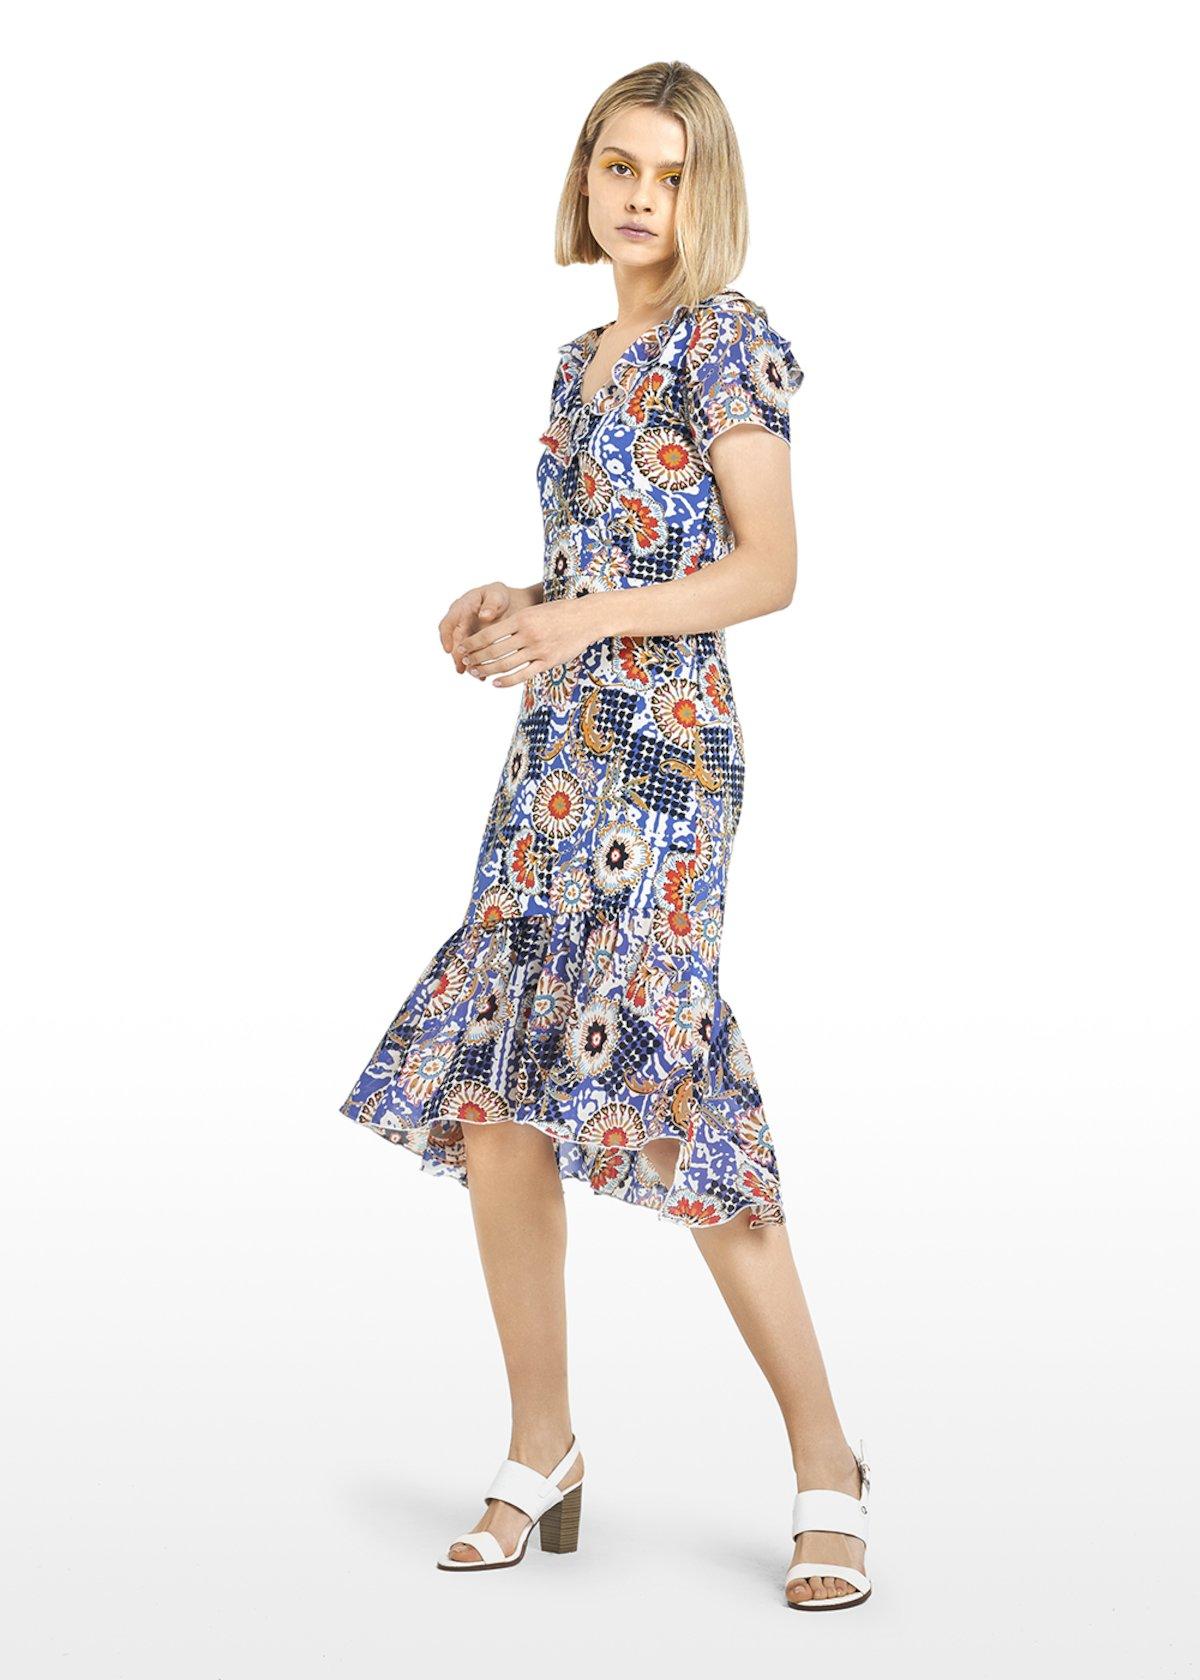 Alvin Short sleeve dress Ankara print - Avion / White Fantasia - Woman